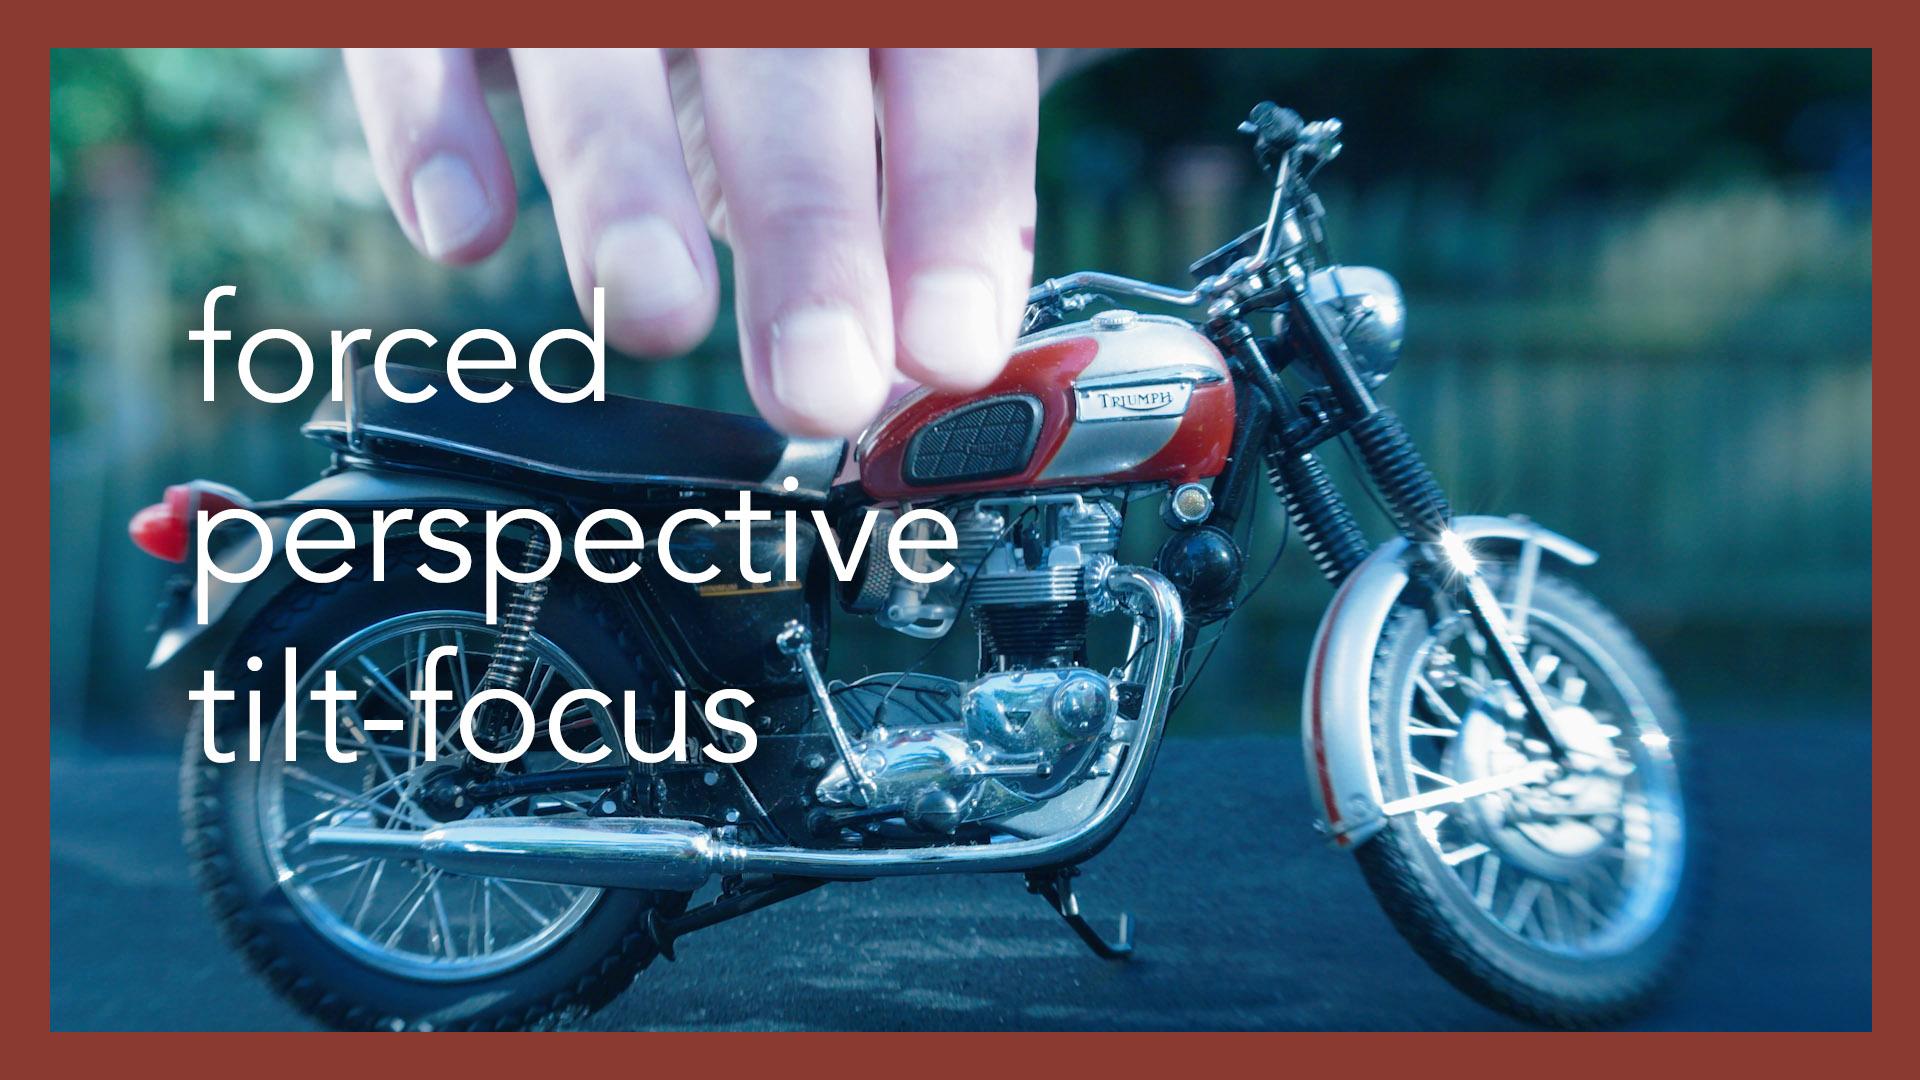 Forced Perspective Tilt-Focus